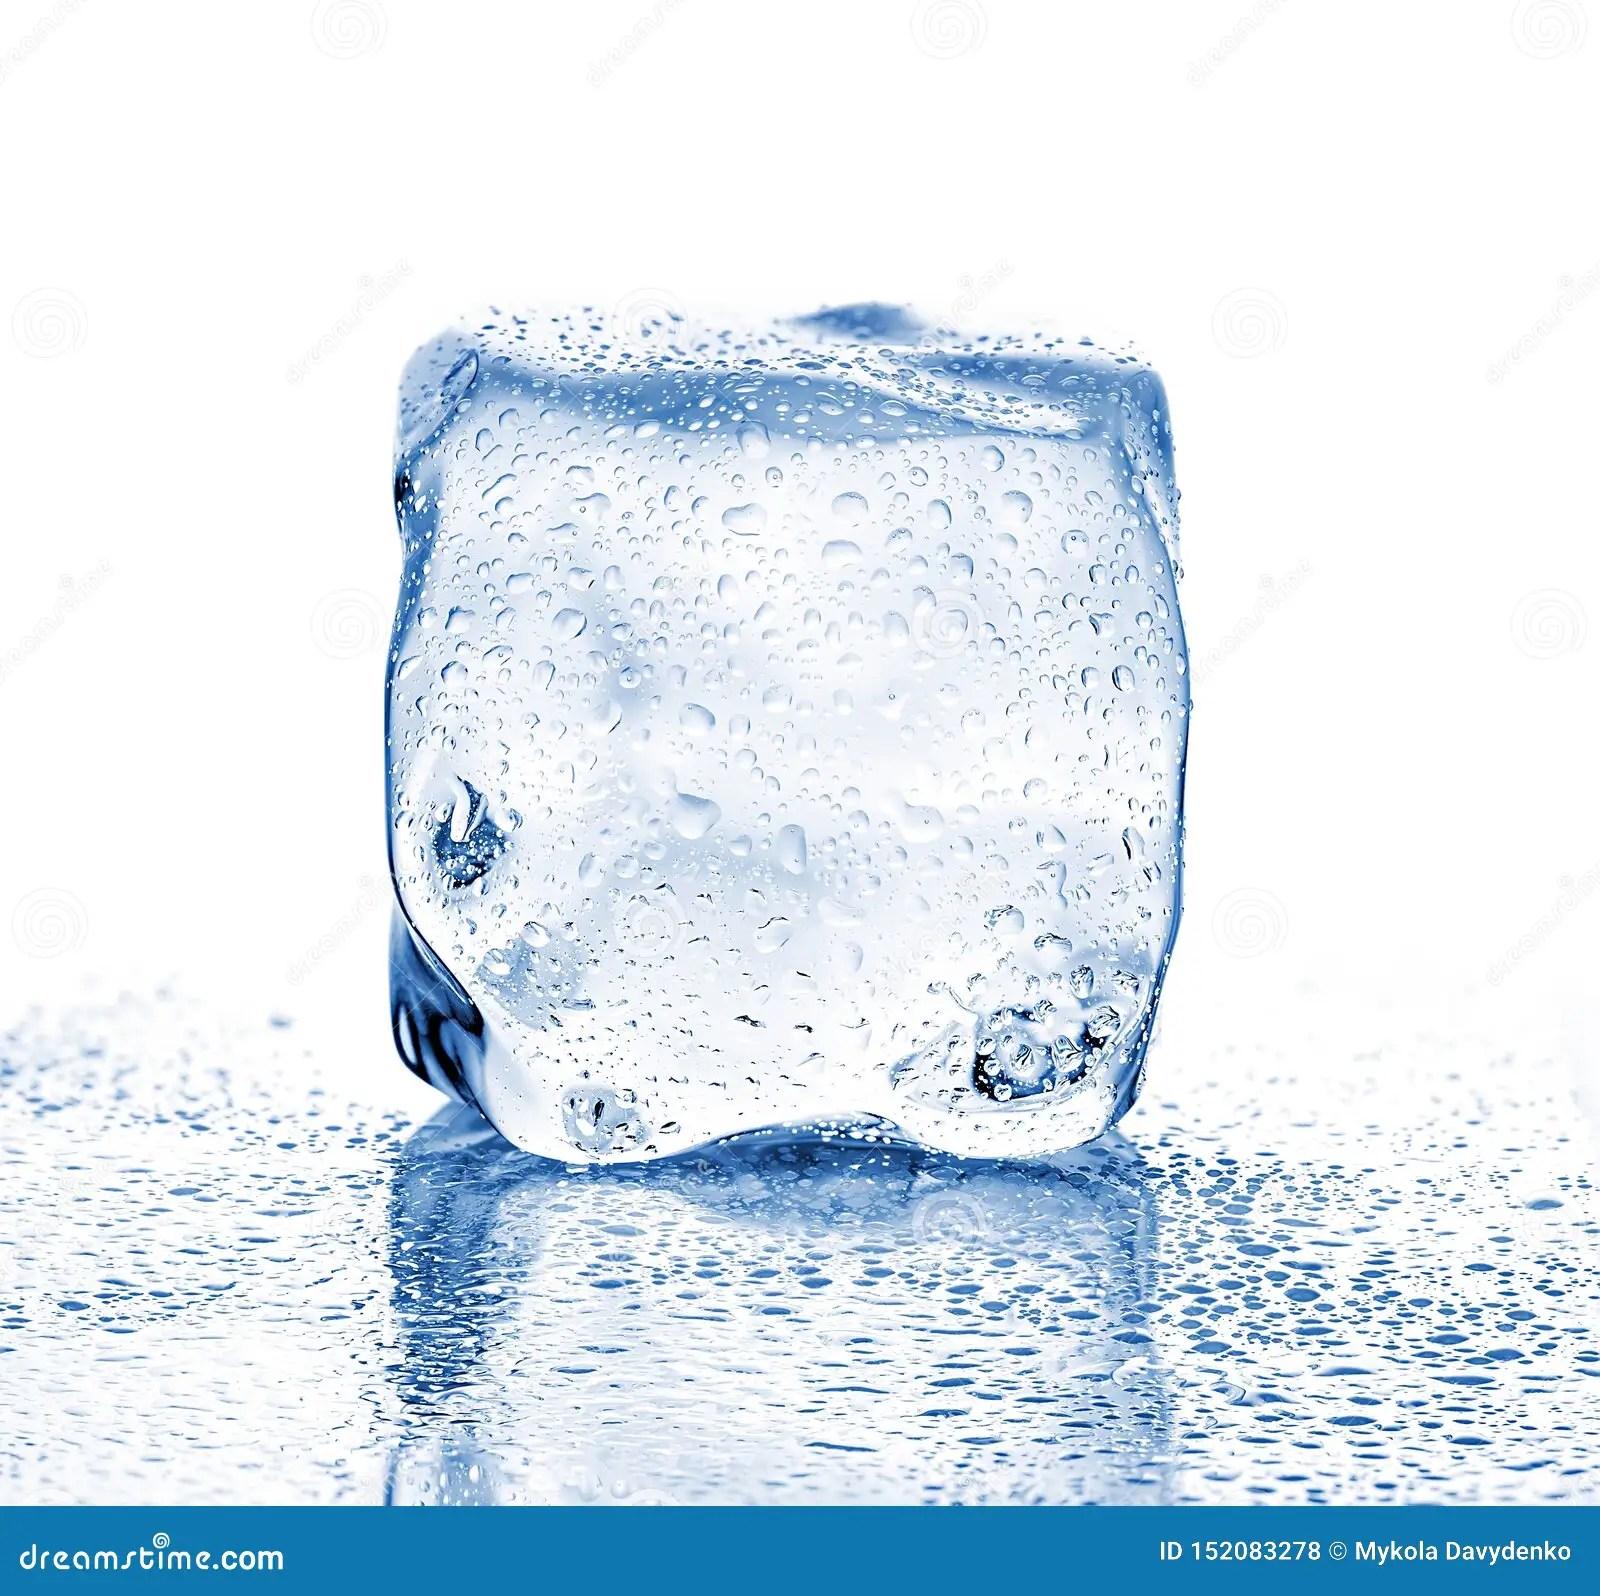 Melting Ice Cube Close Up On A White Background Stock